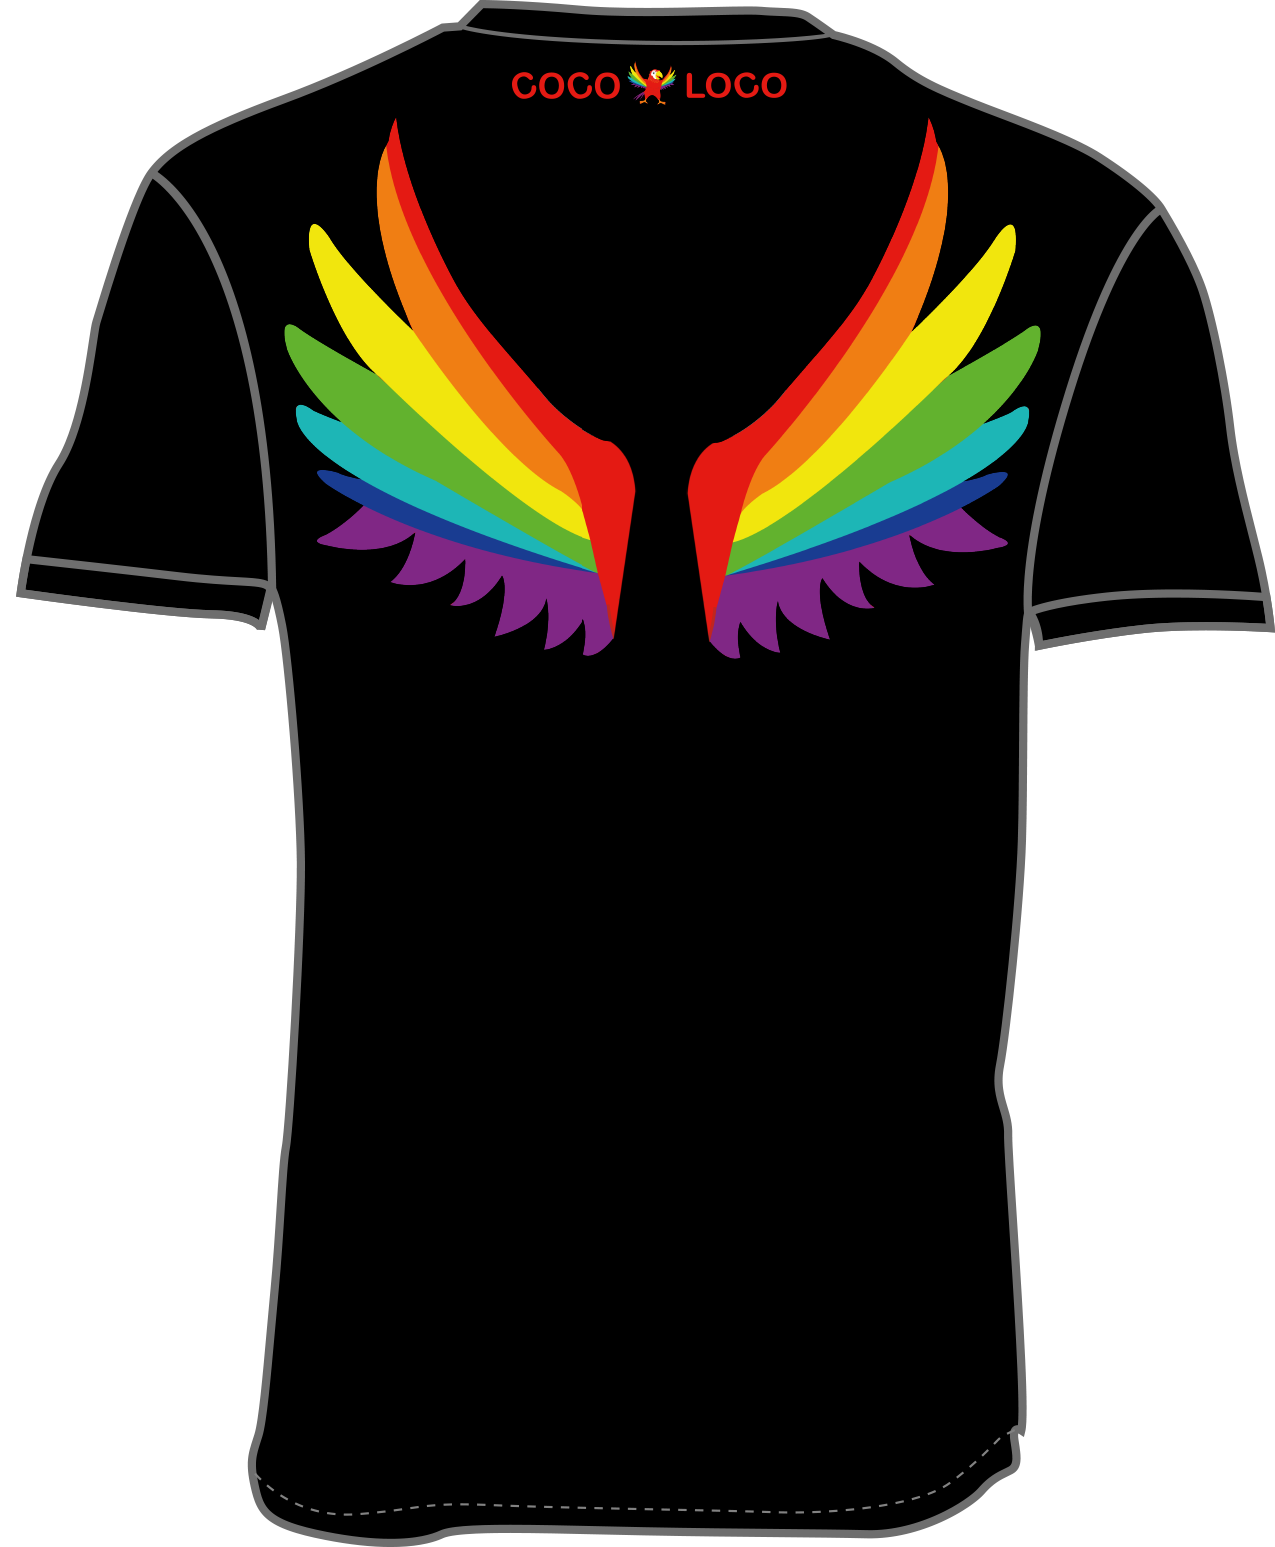 Coco Loco wings T-shirt